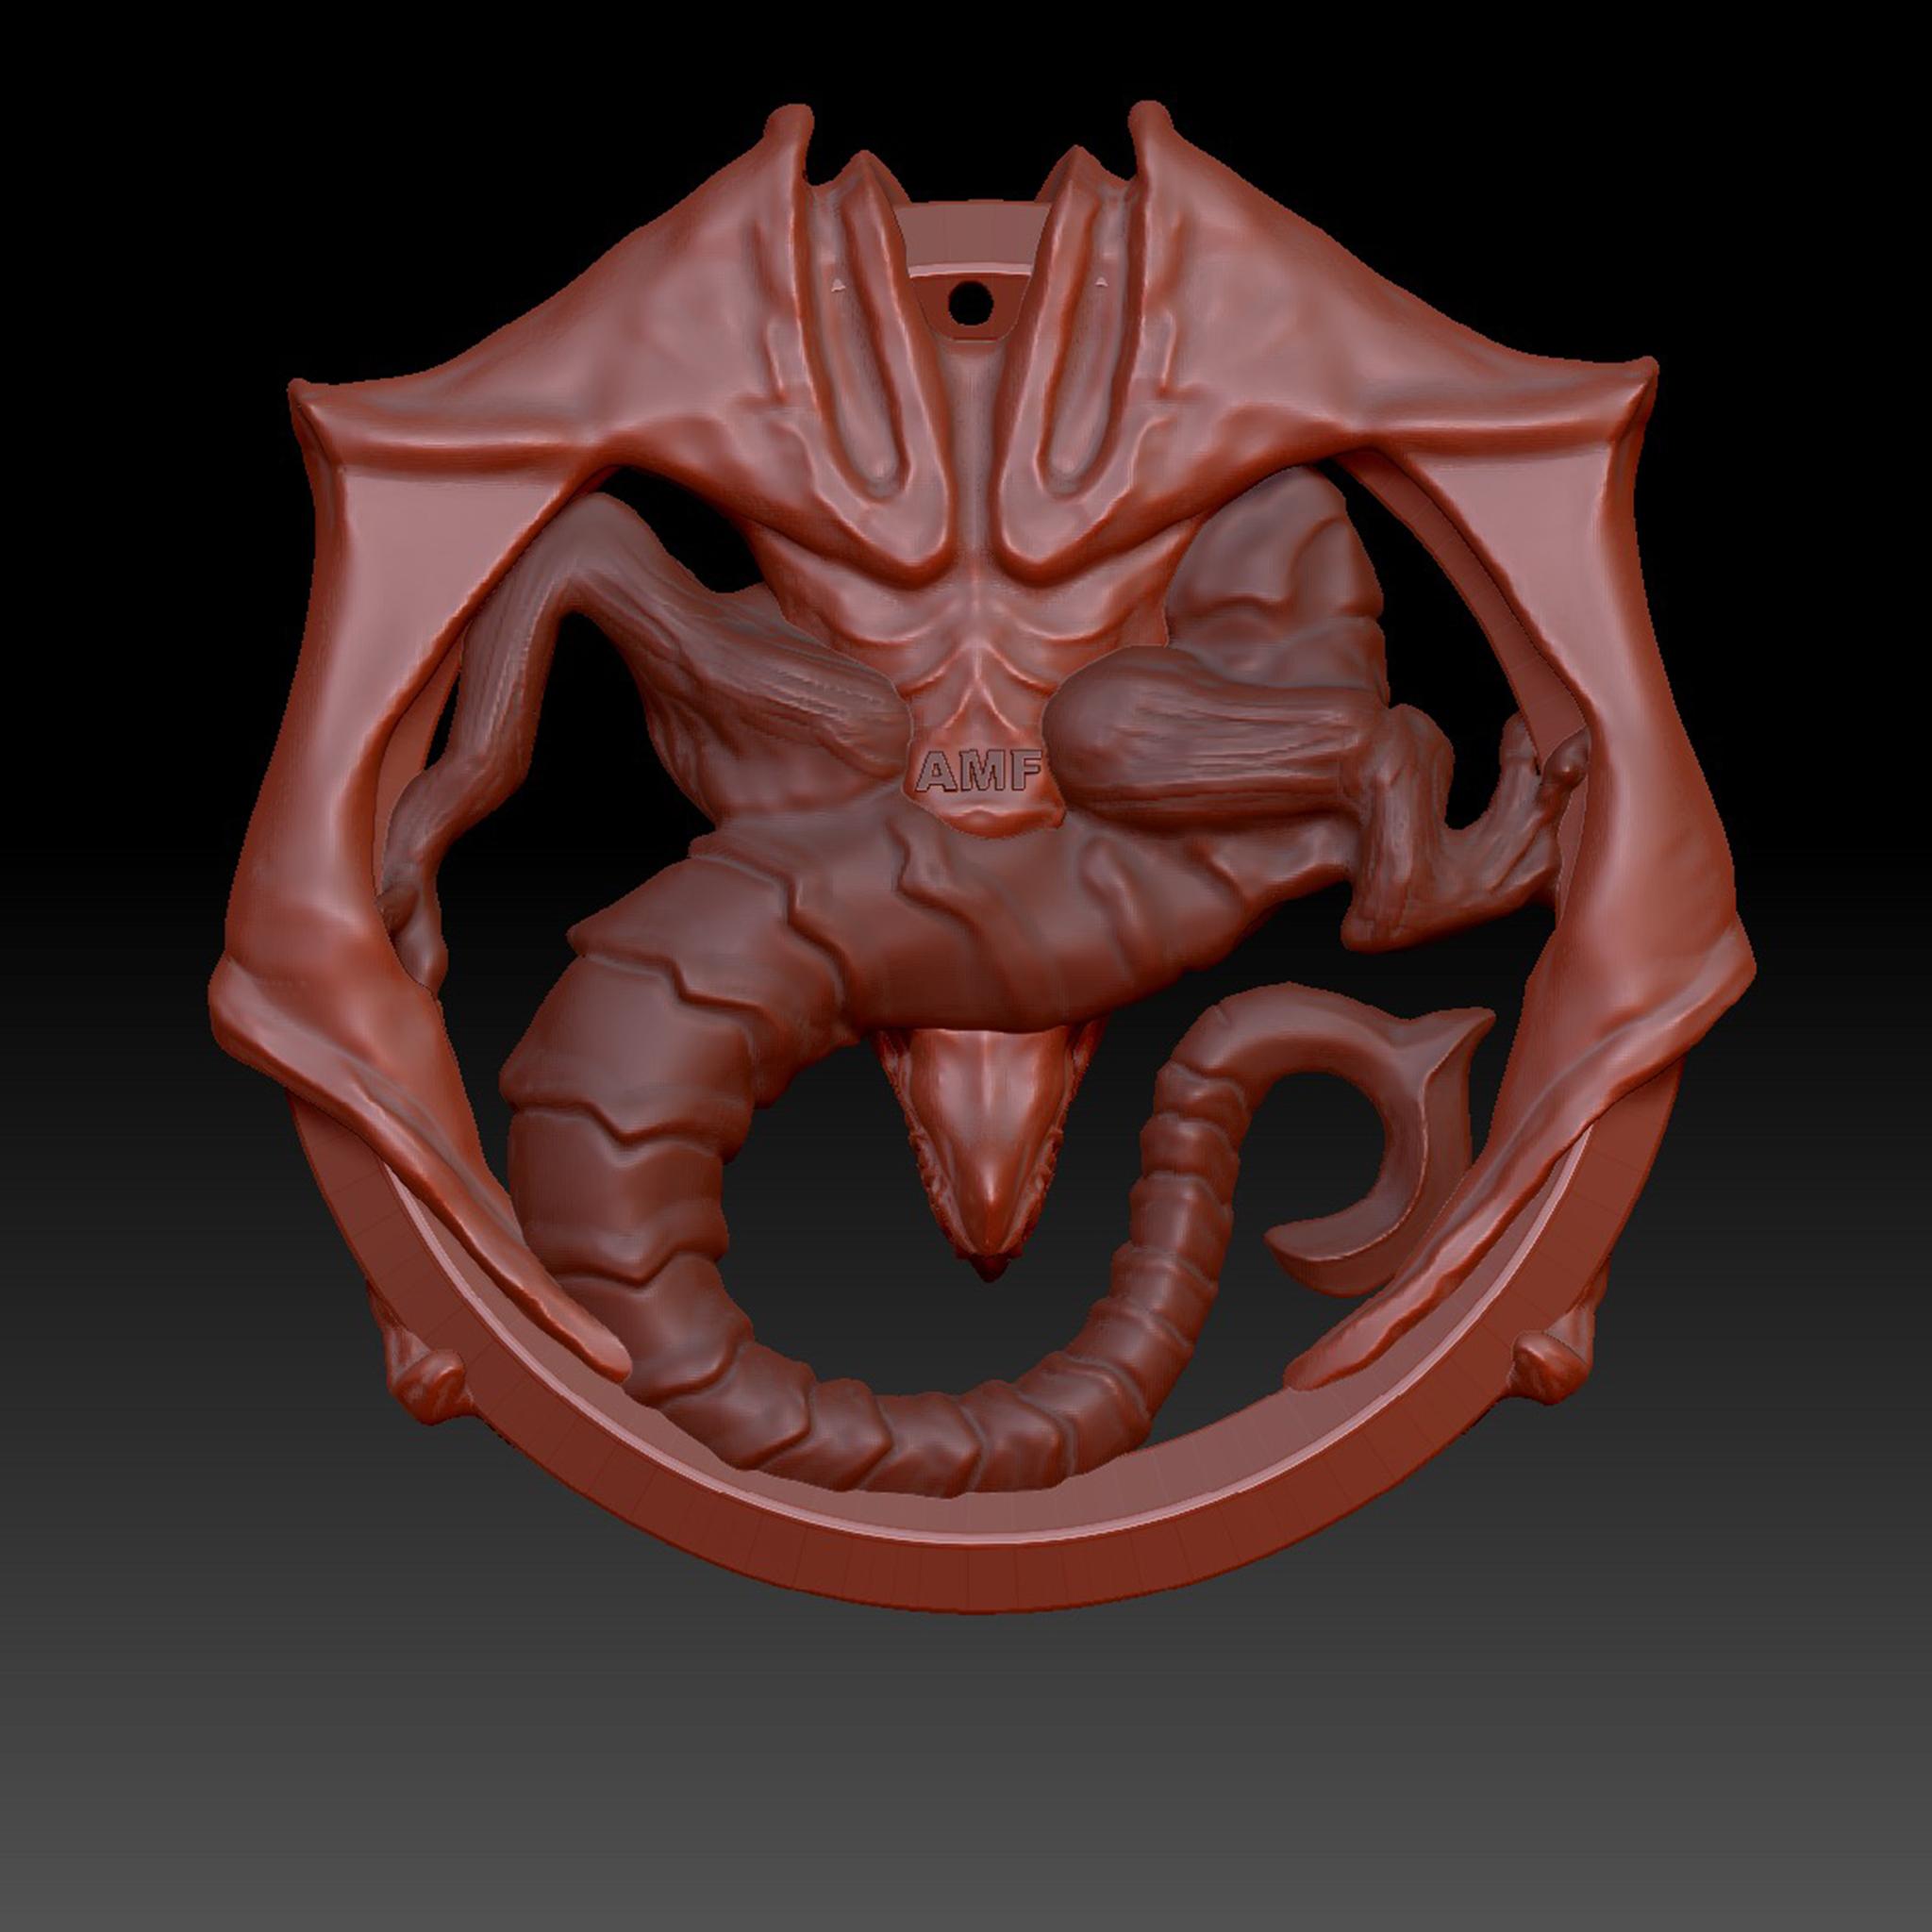 Captura_de_pantalla_2018-05-05_a_las_18.33.17.jpg Download free STL file Dragon Talisman from Castlevania 2 • 3D printable template, dancingchicken